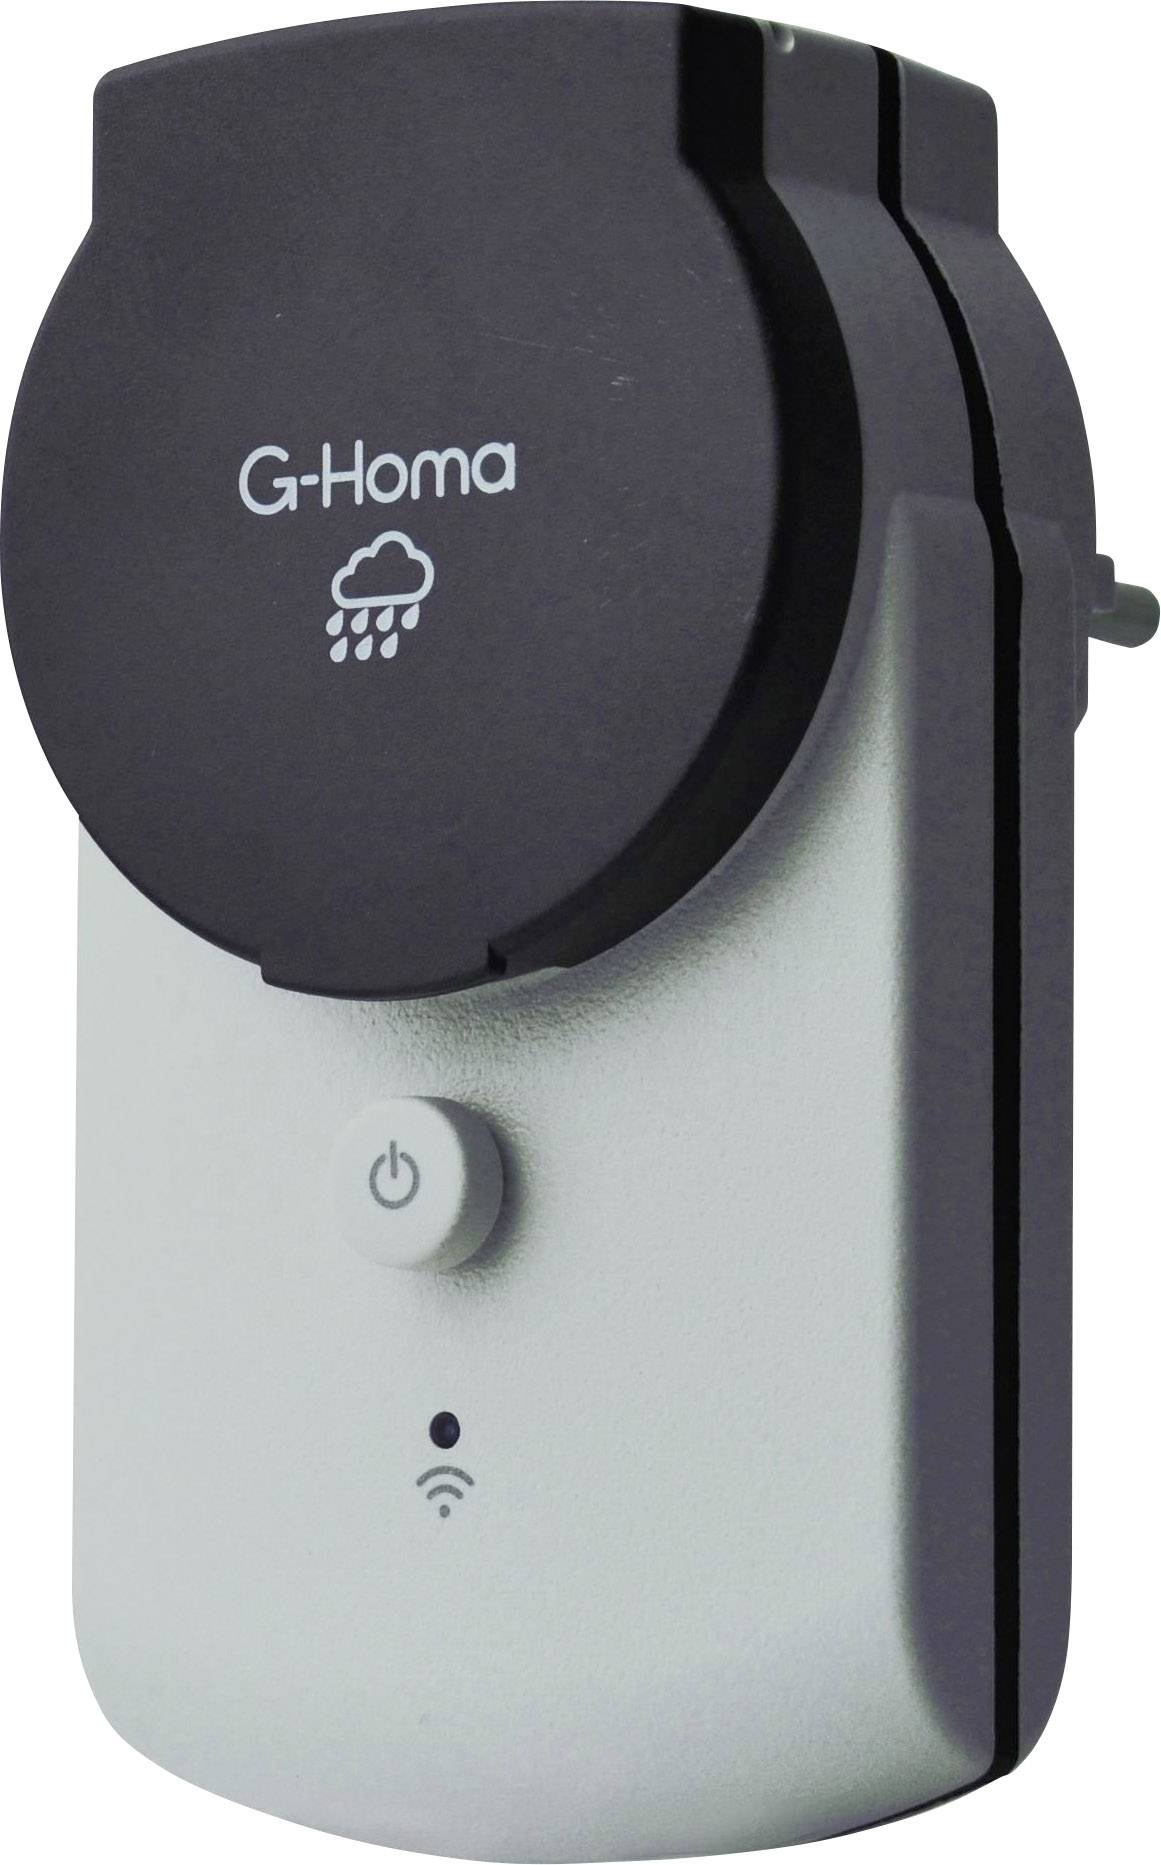 Splitter nya G-Homa 7779 Wi-Fi Trådlös kontaktdosa Utomhus 3680 W | Conrad.se PI-14